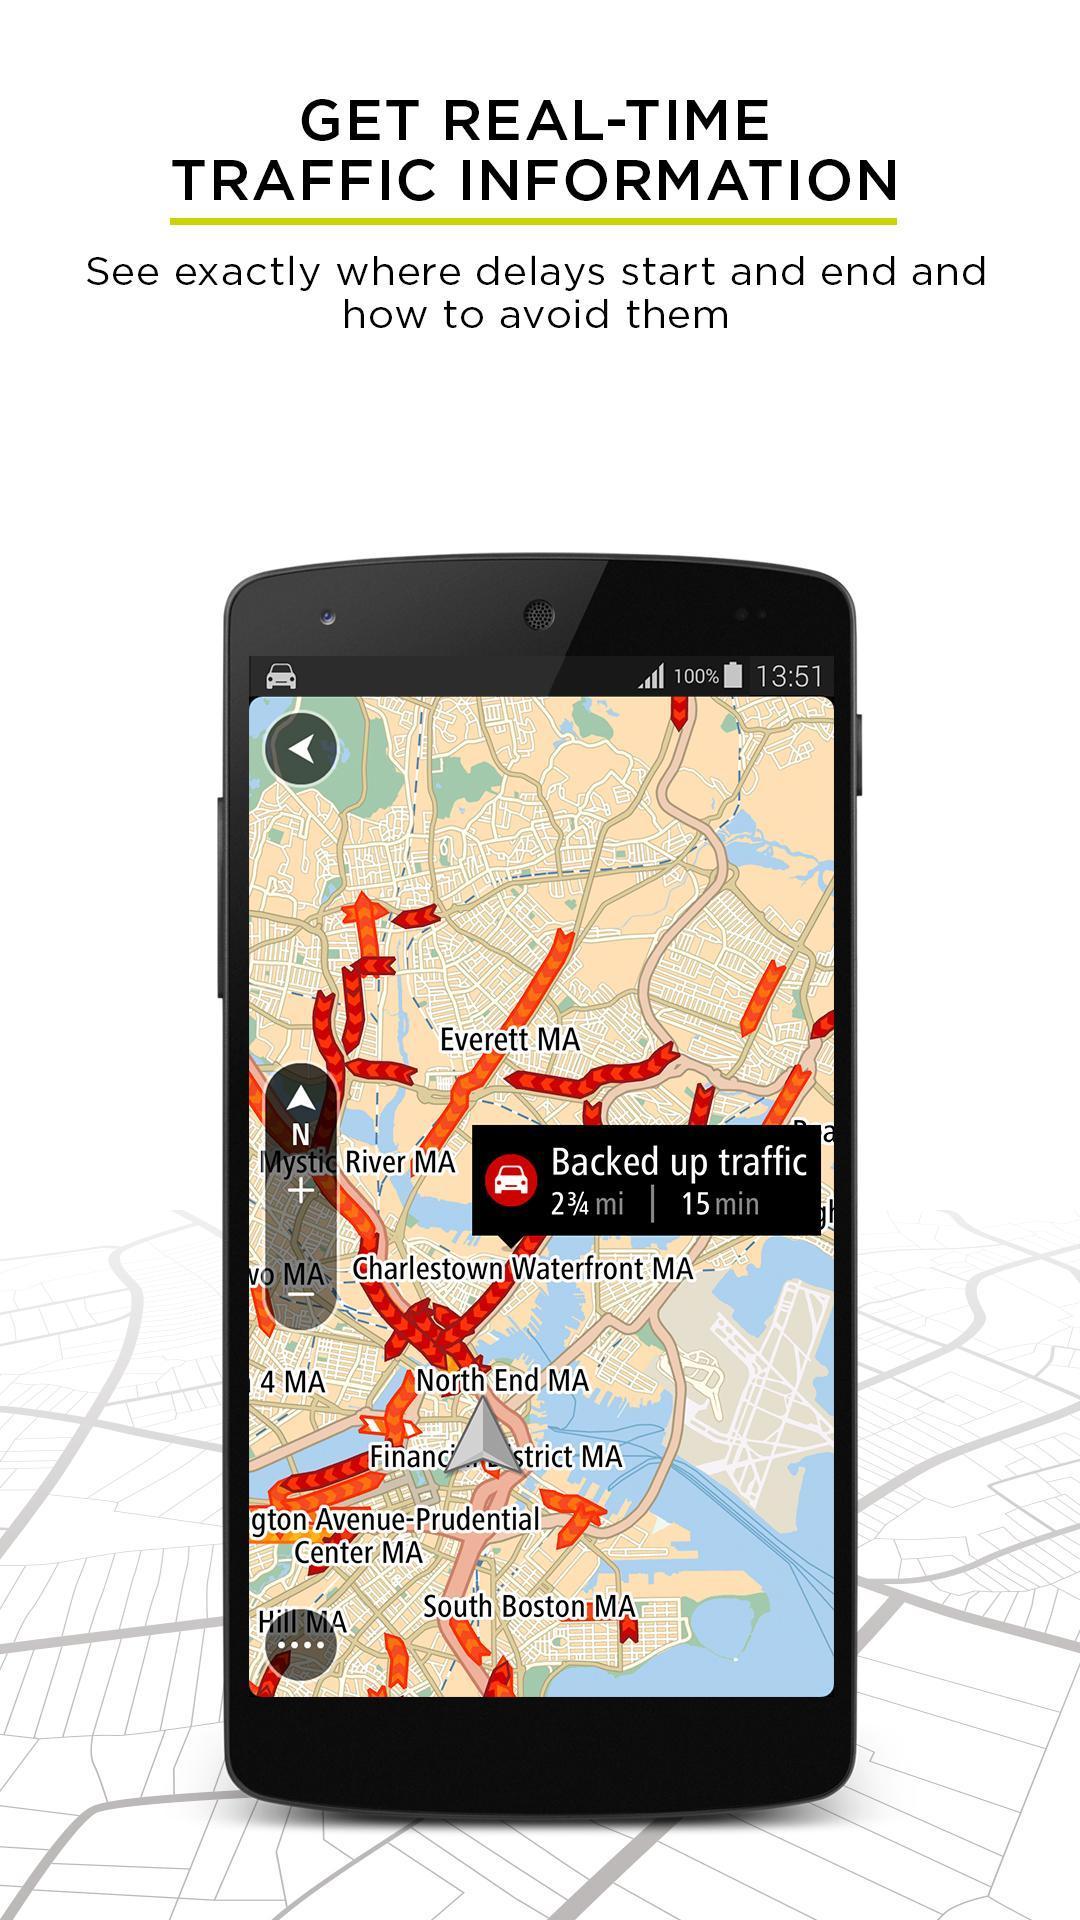 TomTom GPS Navigation - Live Traffic Alerts & Maps 2.0.4 Screenshot 2